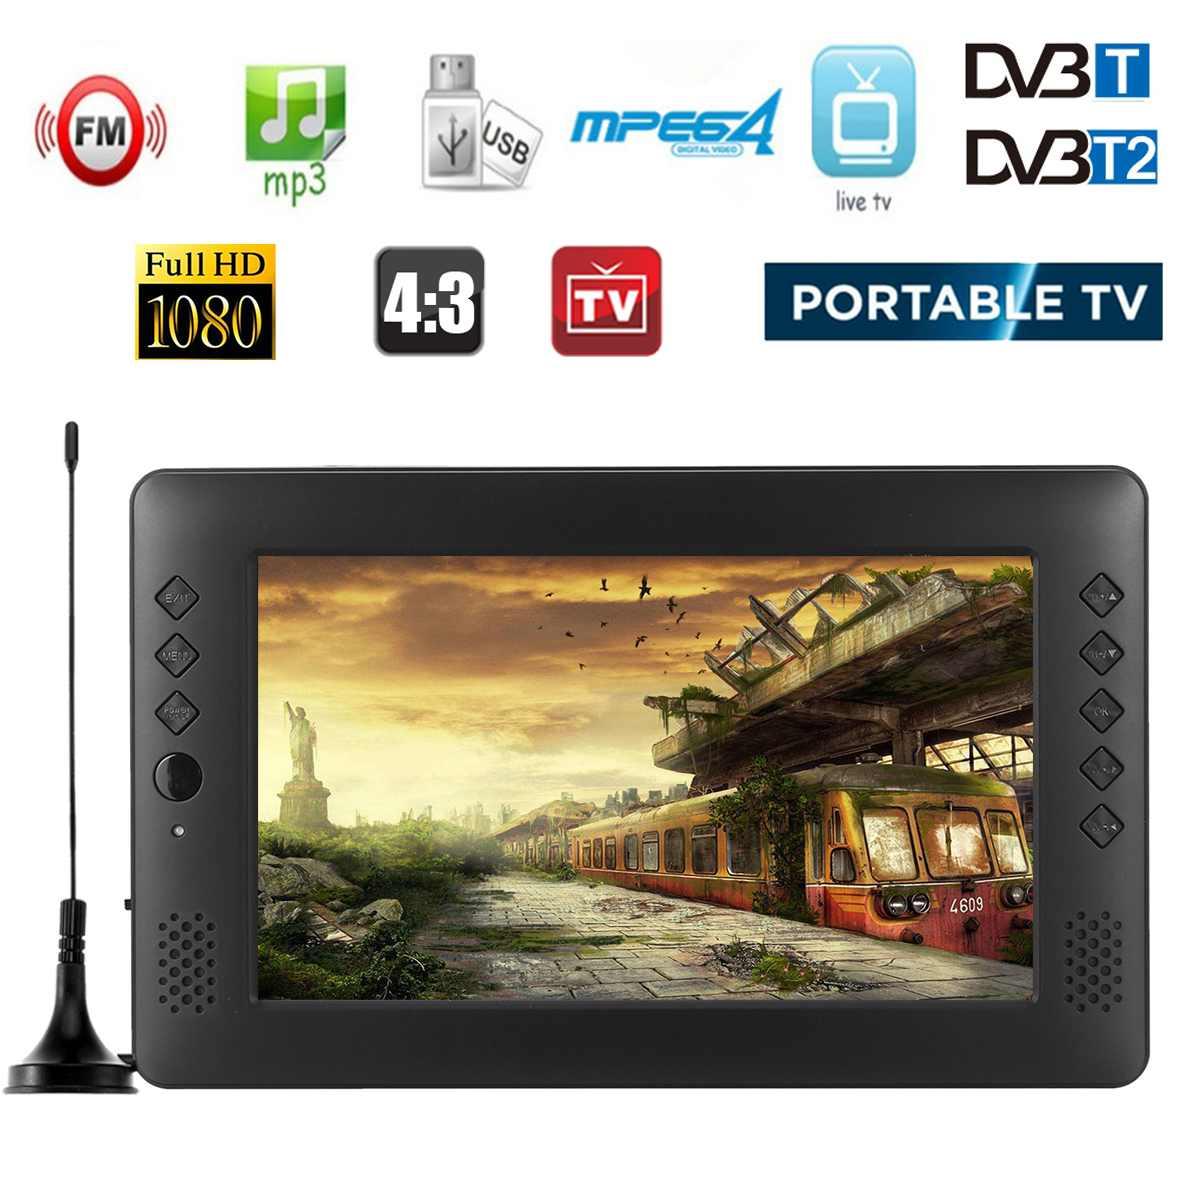 12V 9 polegada HD Portátil Mini WiFi TV Digital e Analógica DVB-T2 DVB-T DTV ATV Car Smart Tv USB MP4 Cartão TF de Áudio e Vídeo